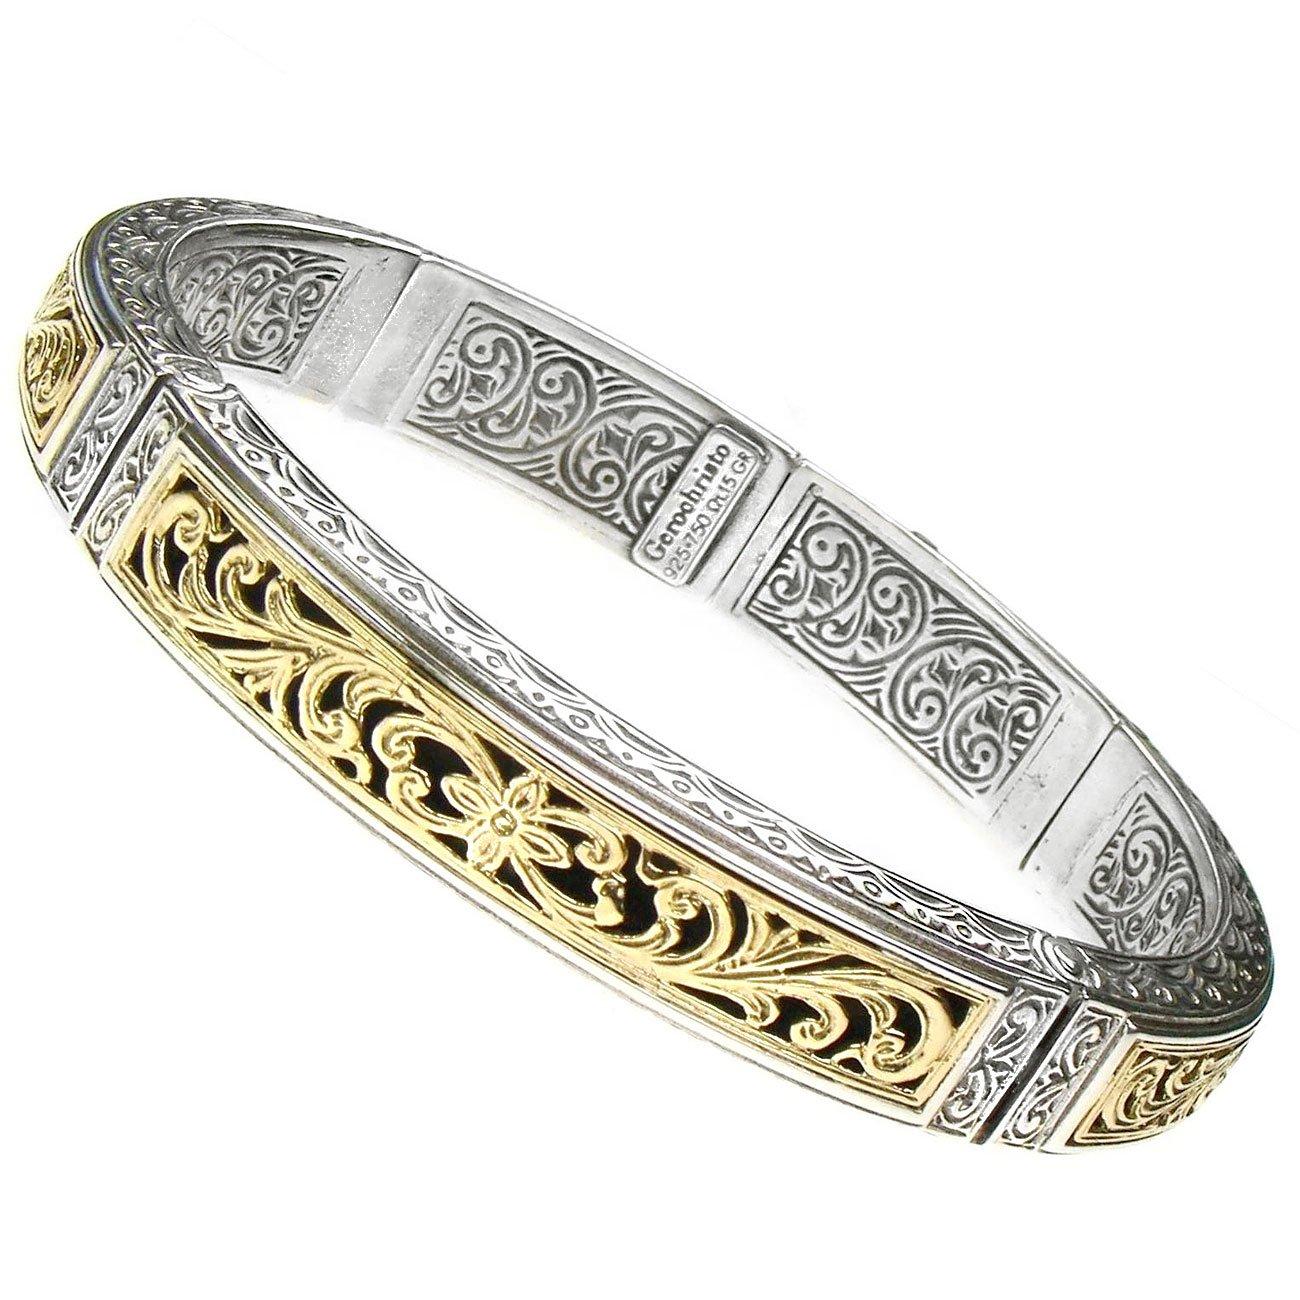 Gerochristo 6289 - Solid Gold & Silver Medieval Byzantine Cuff Bracelet